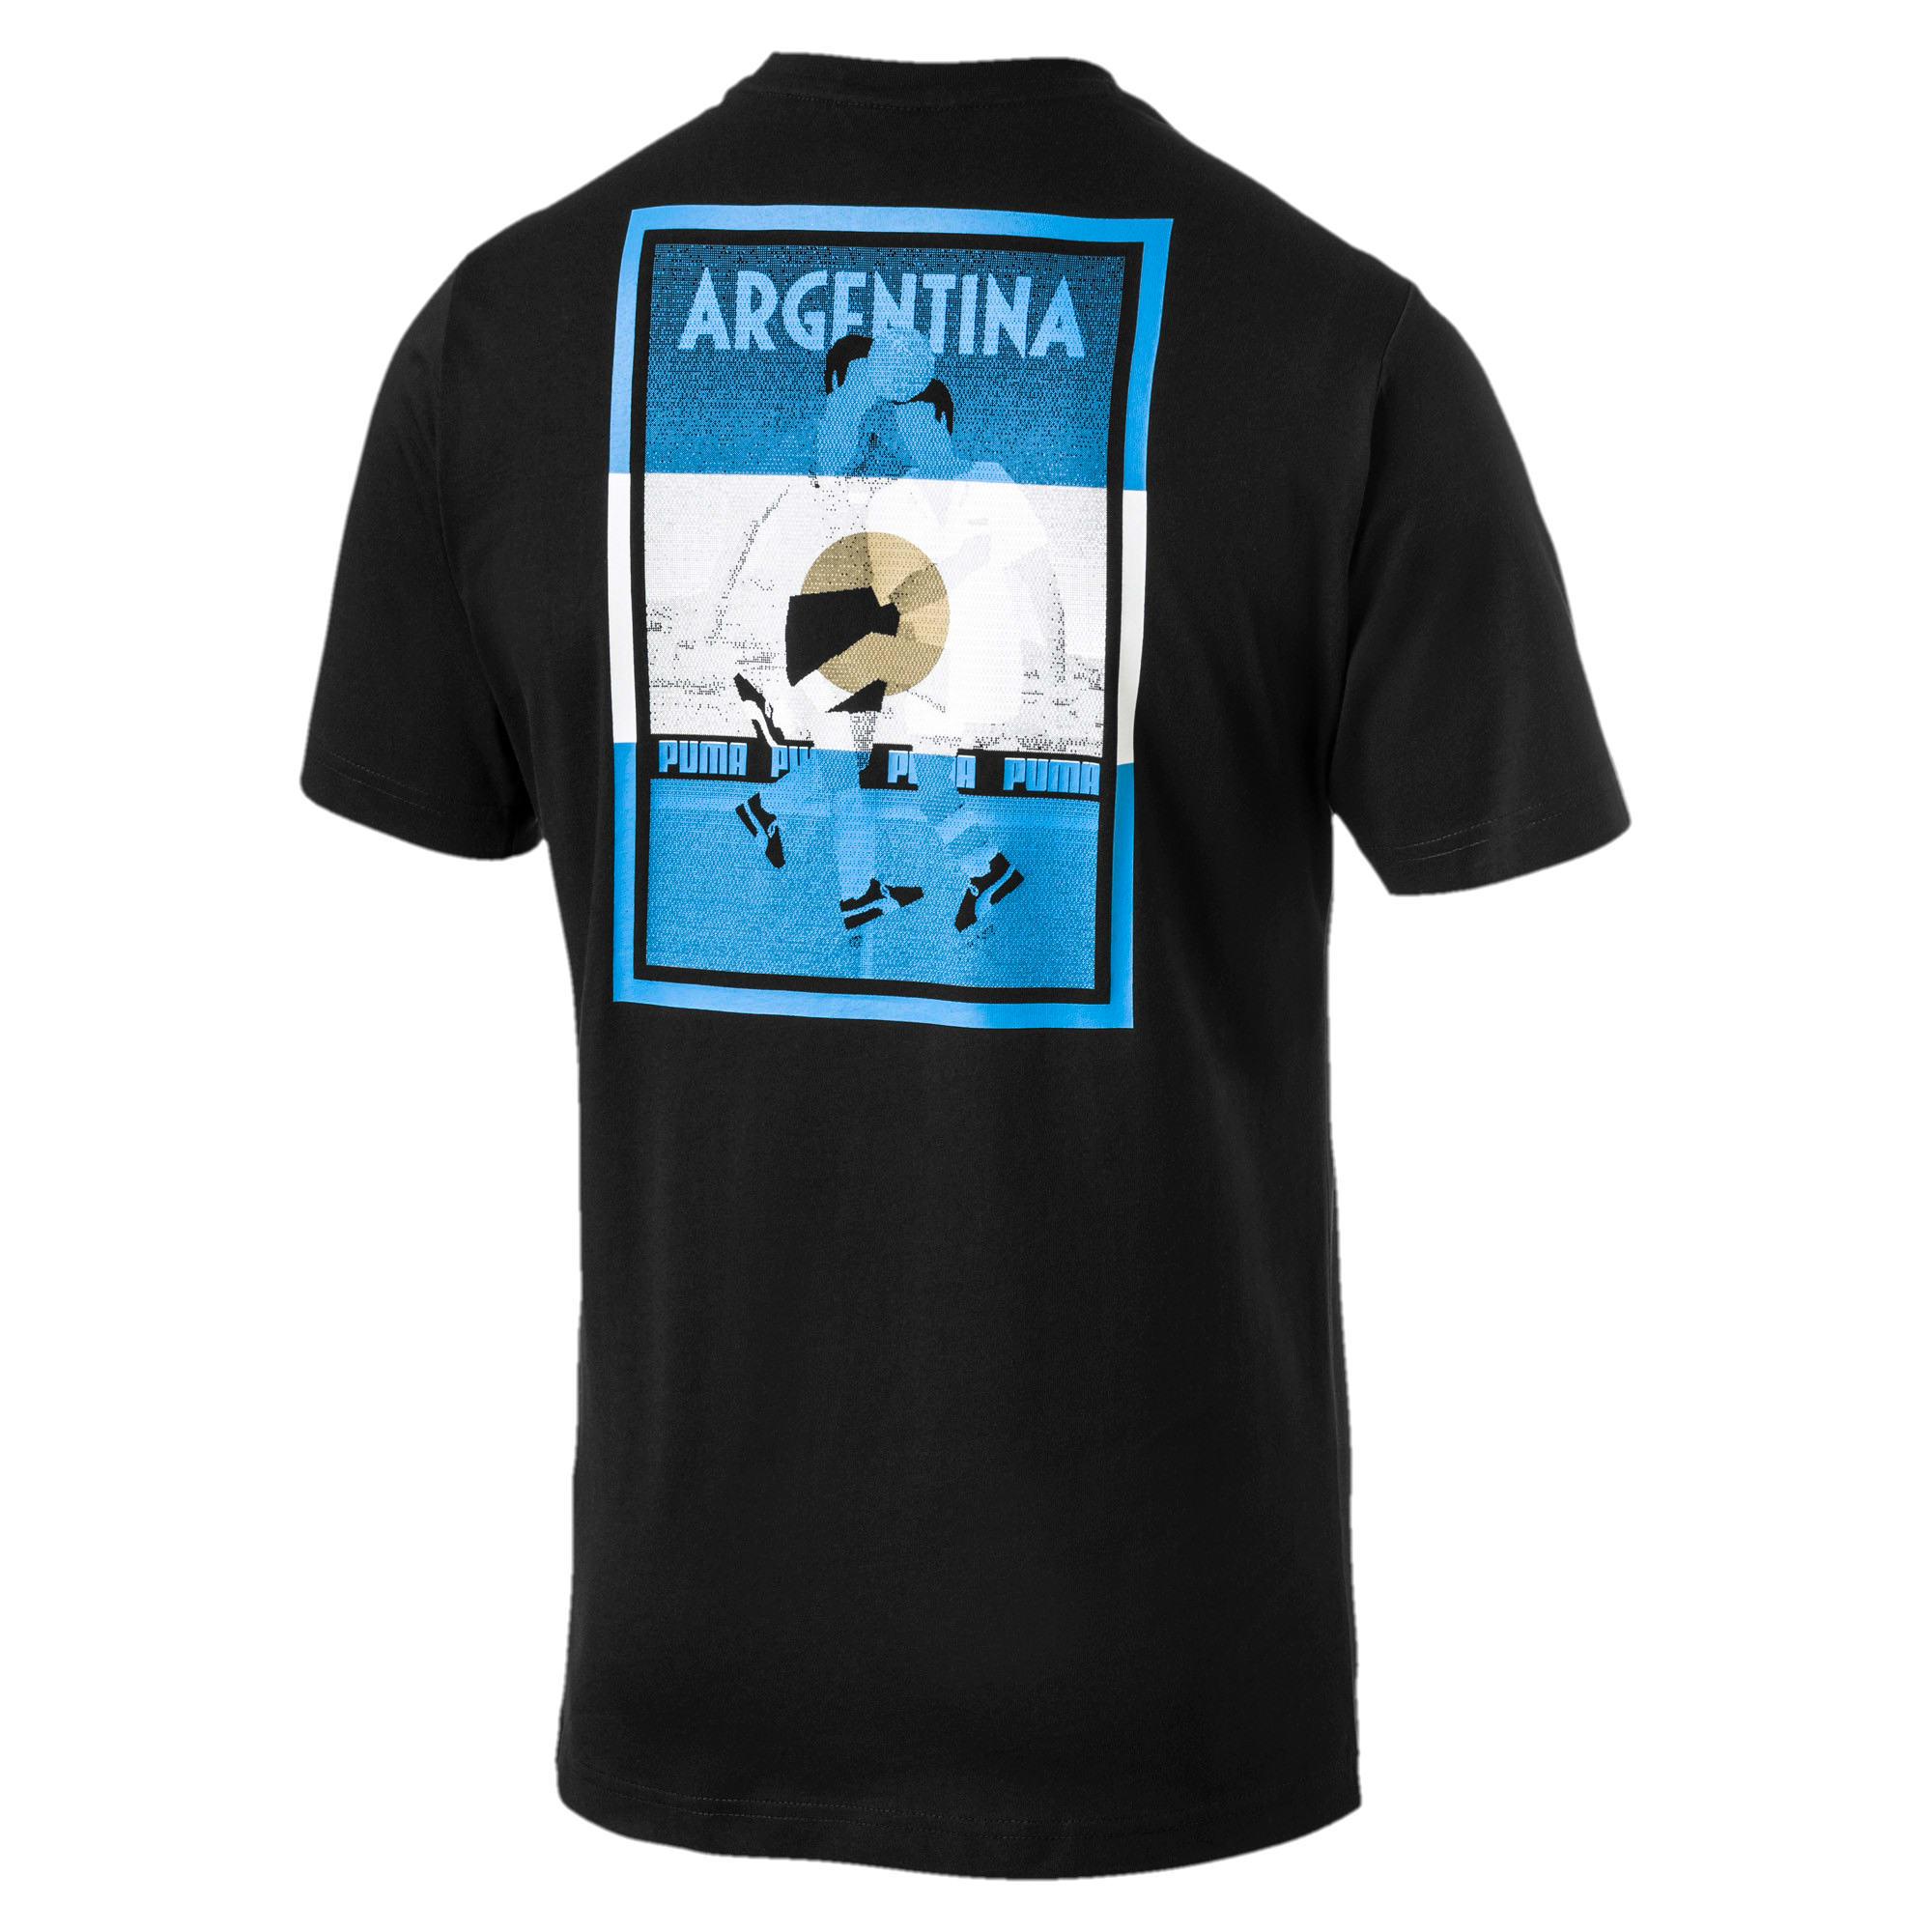 Thumbnail 3 of Copa America Men's Cotton Tee, Puma Black-Argentina, medium